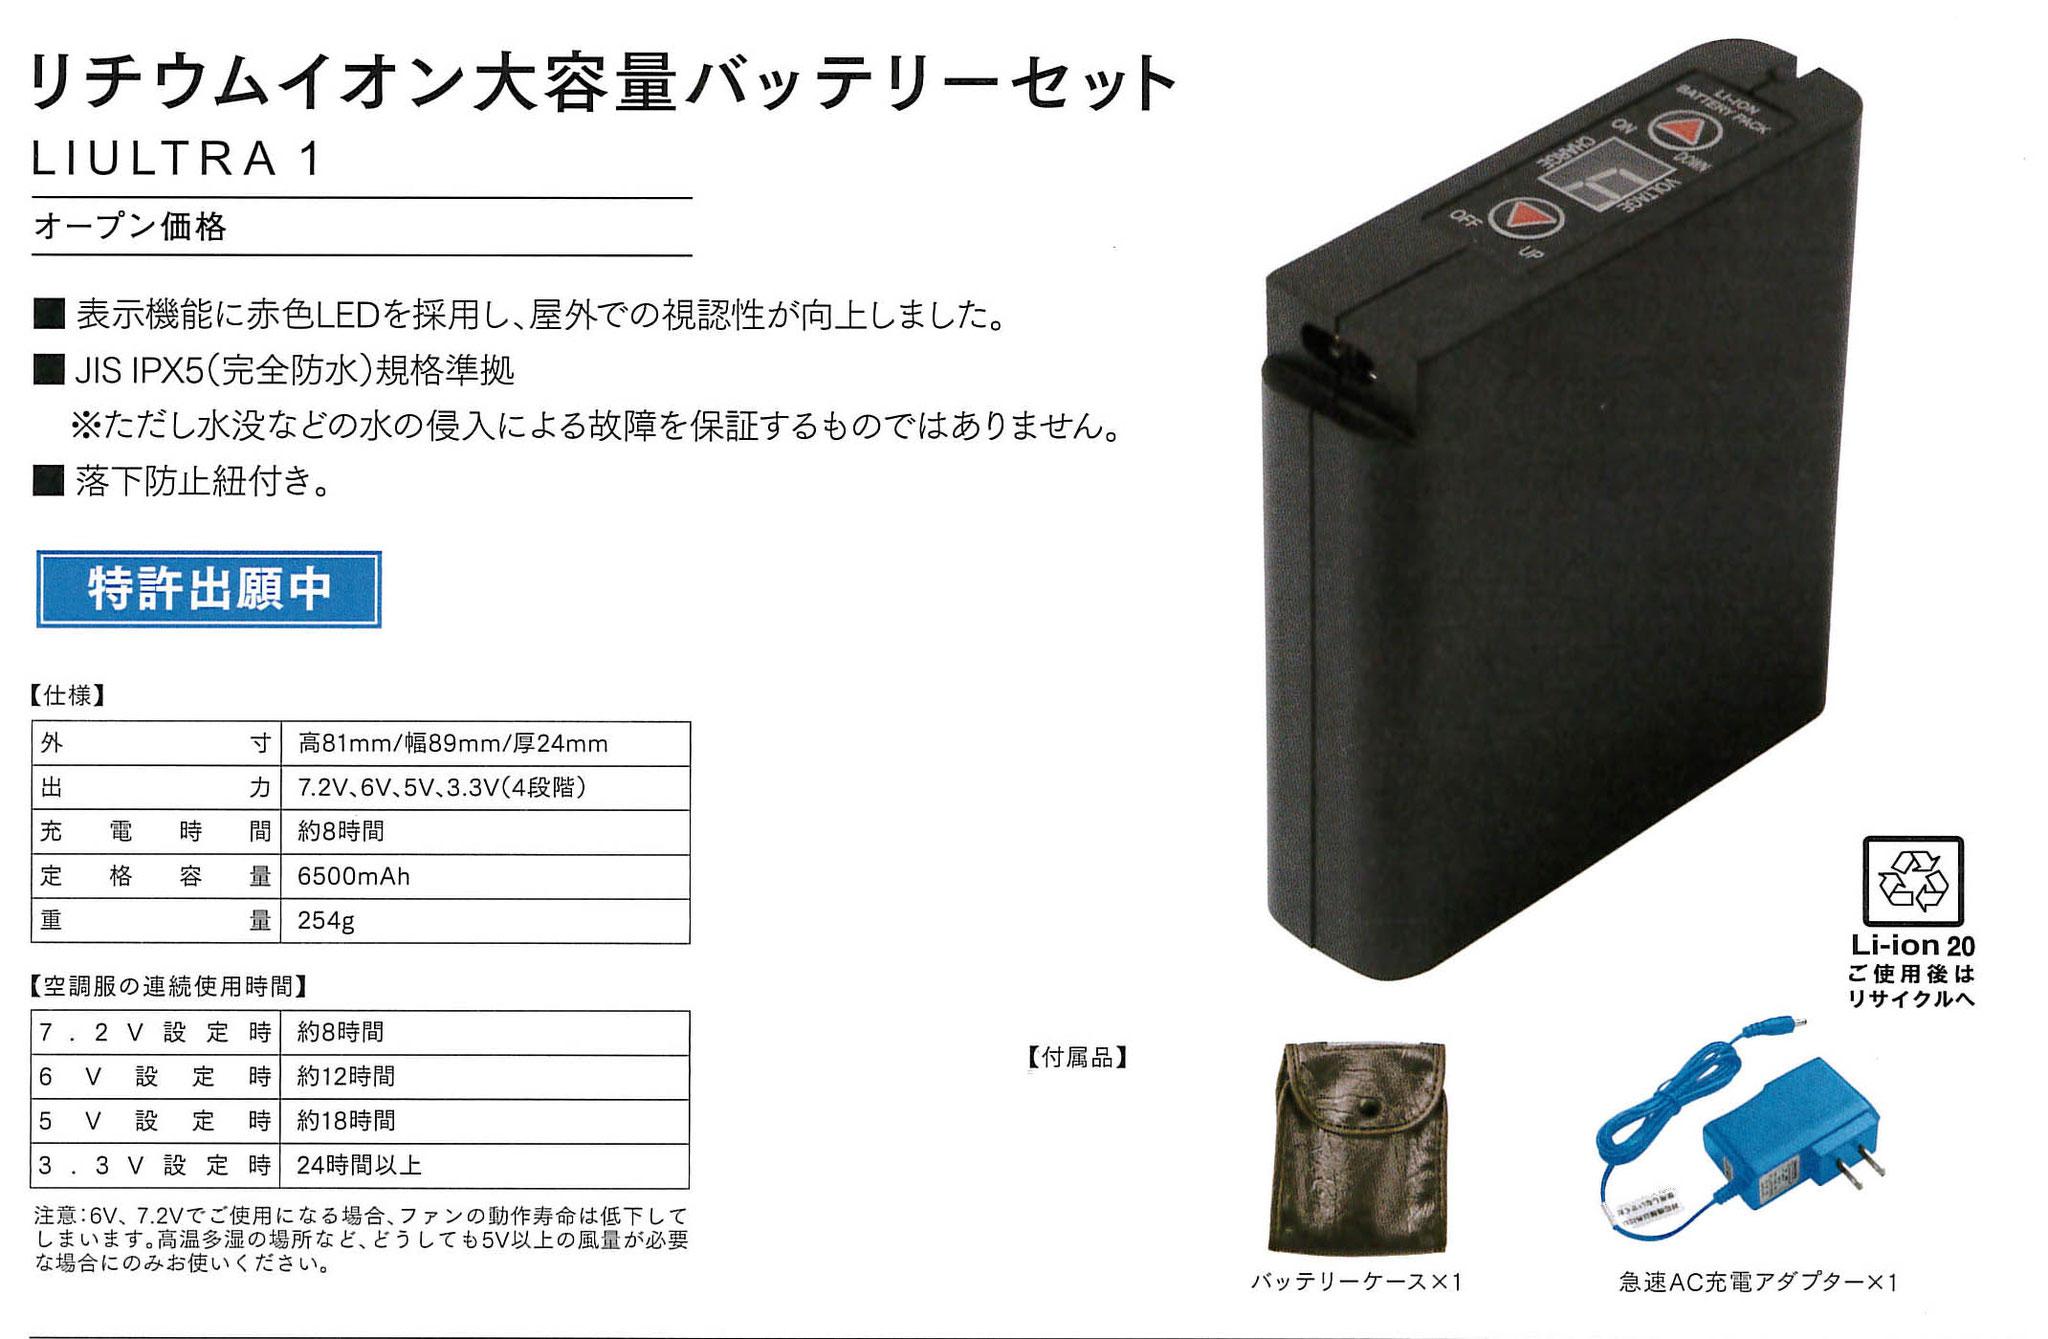 LIULTRA1J リチウムイオン大容量バッテリーセット ¥9,900(税込)